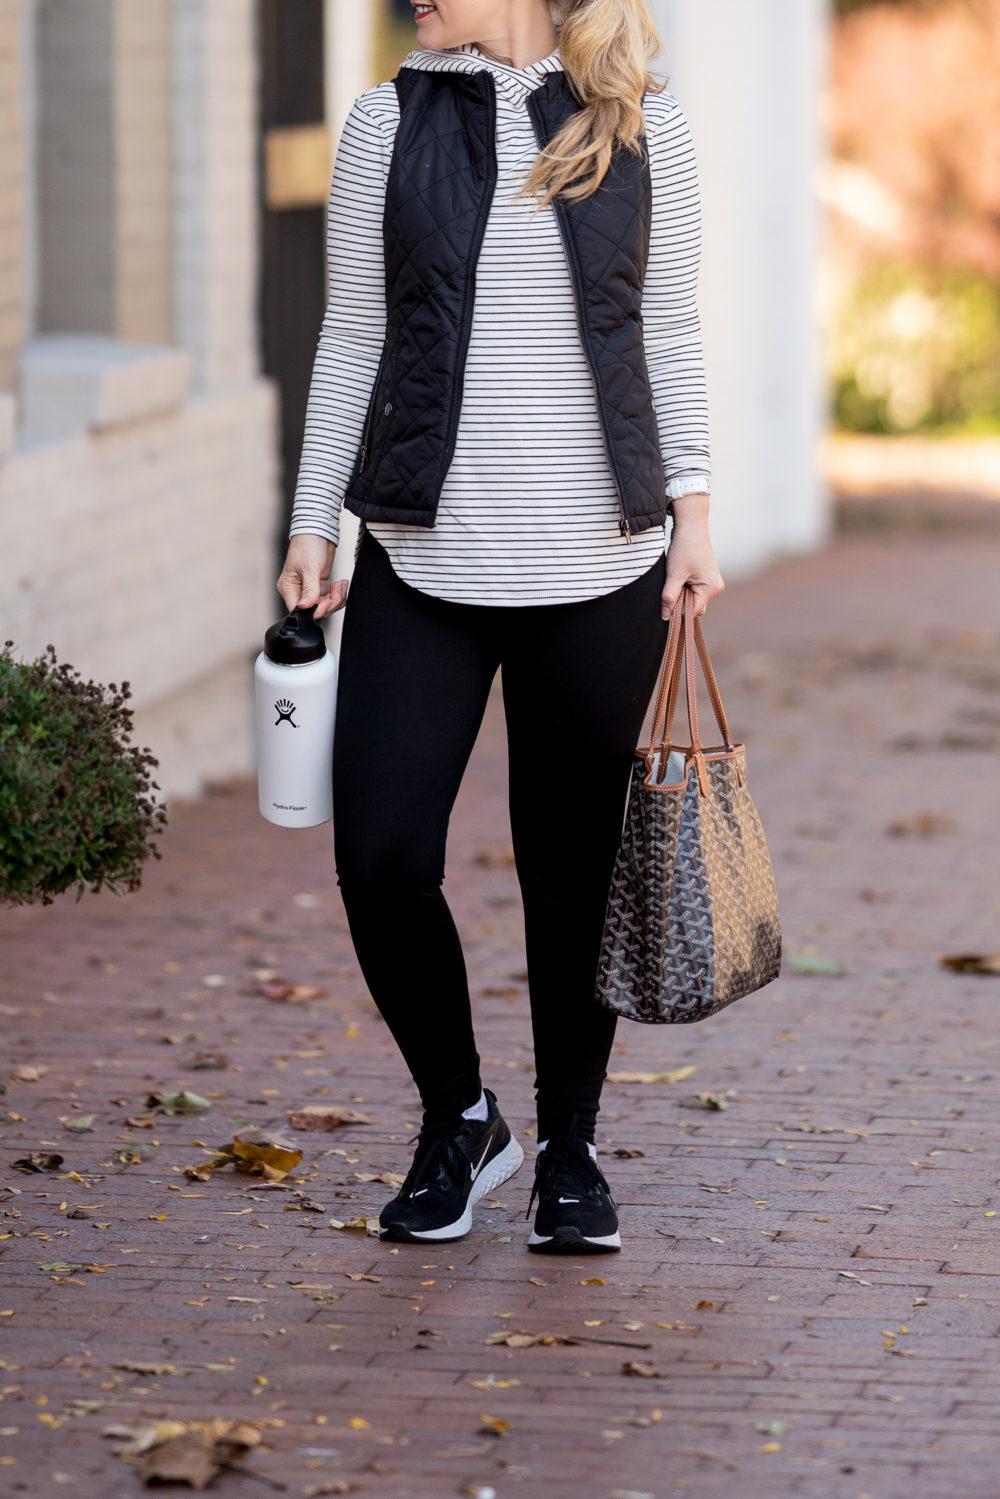 Petite Fashion Blog | Amazon Core 10 Leggings | Amazon Essentials Stripe Pullover | Amazon Women's Leggings | Puffer Vest